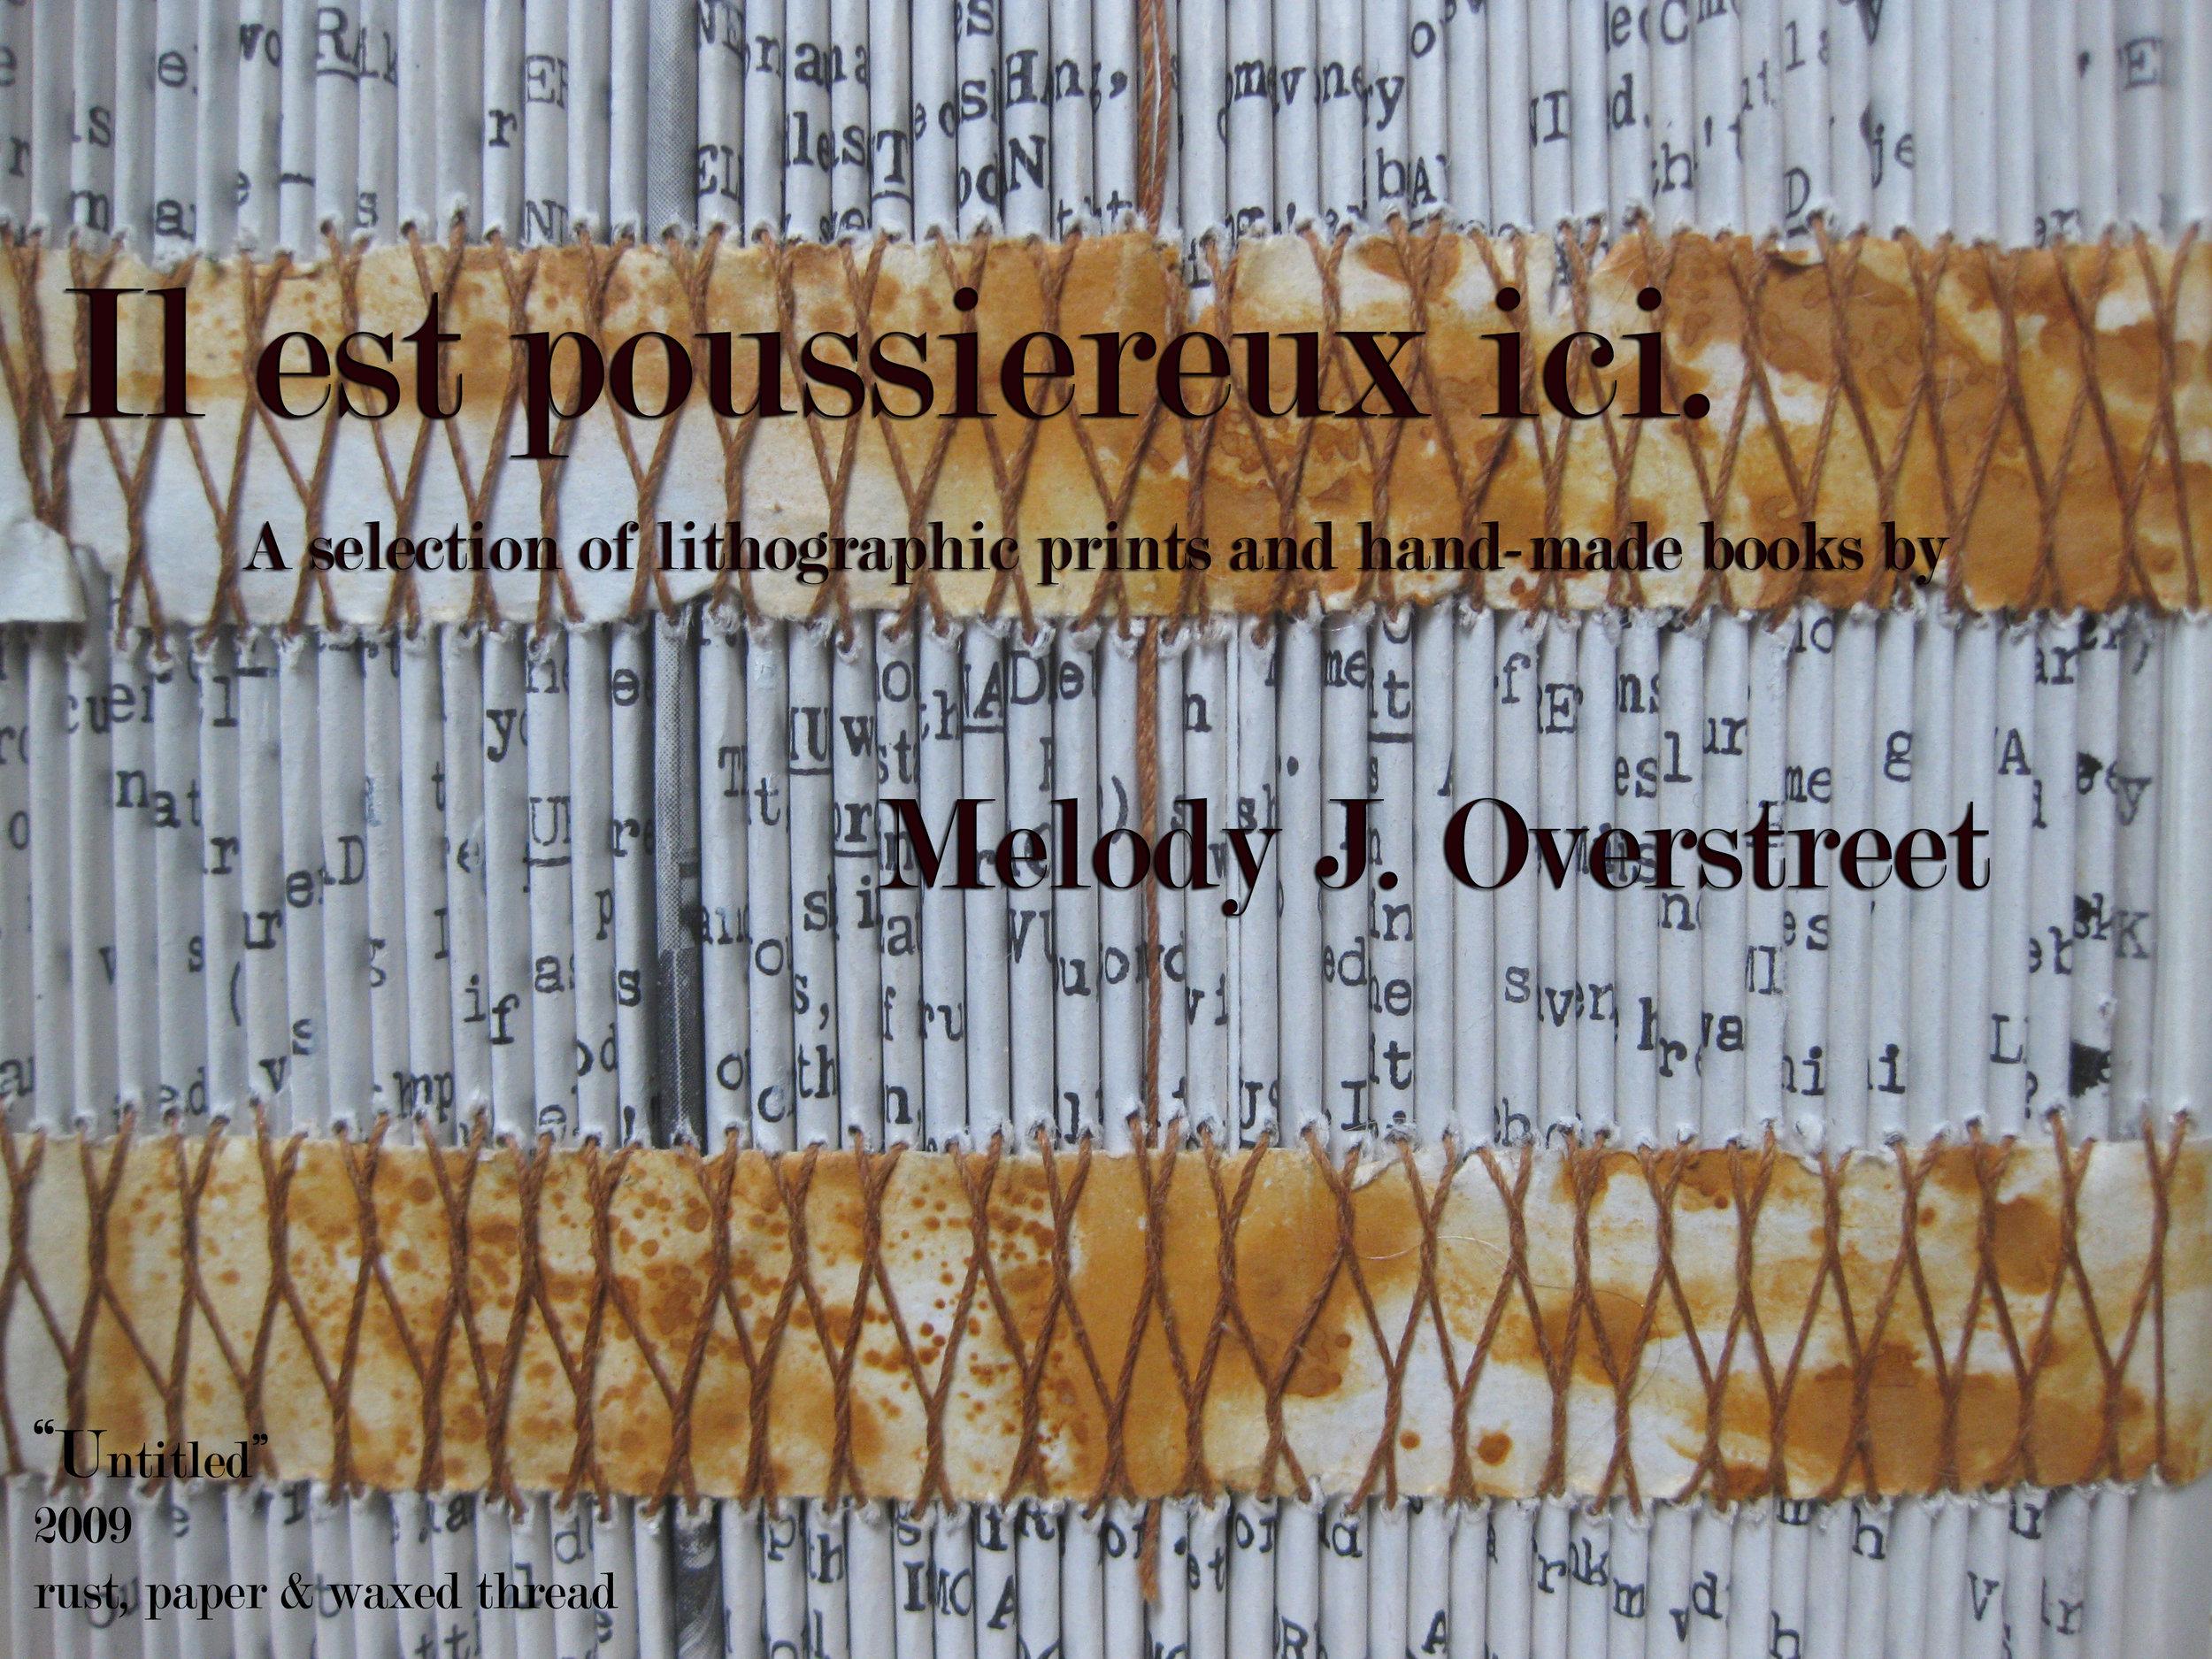 overstreet-senior-exhibit.jpg